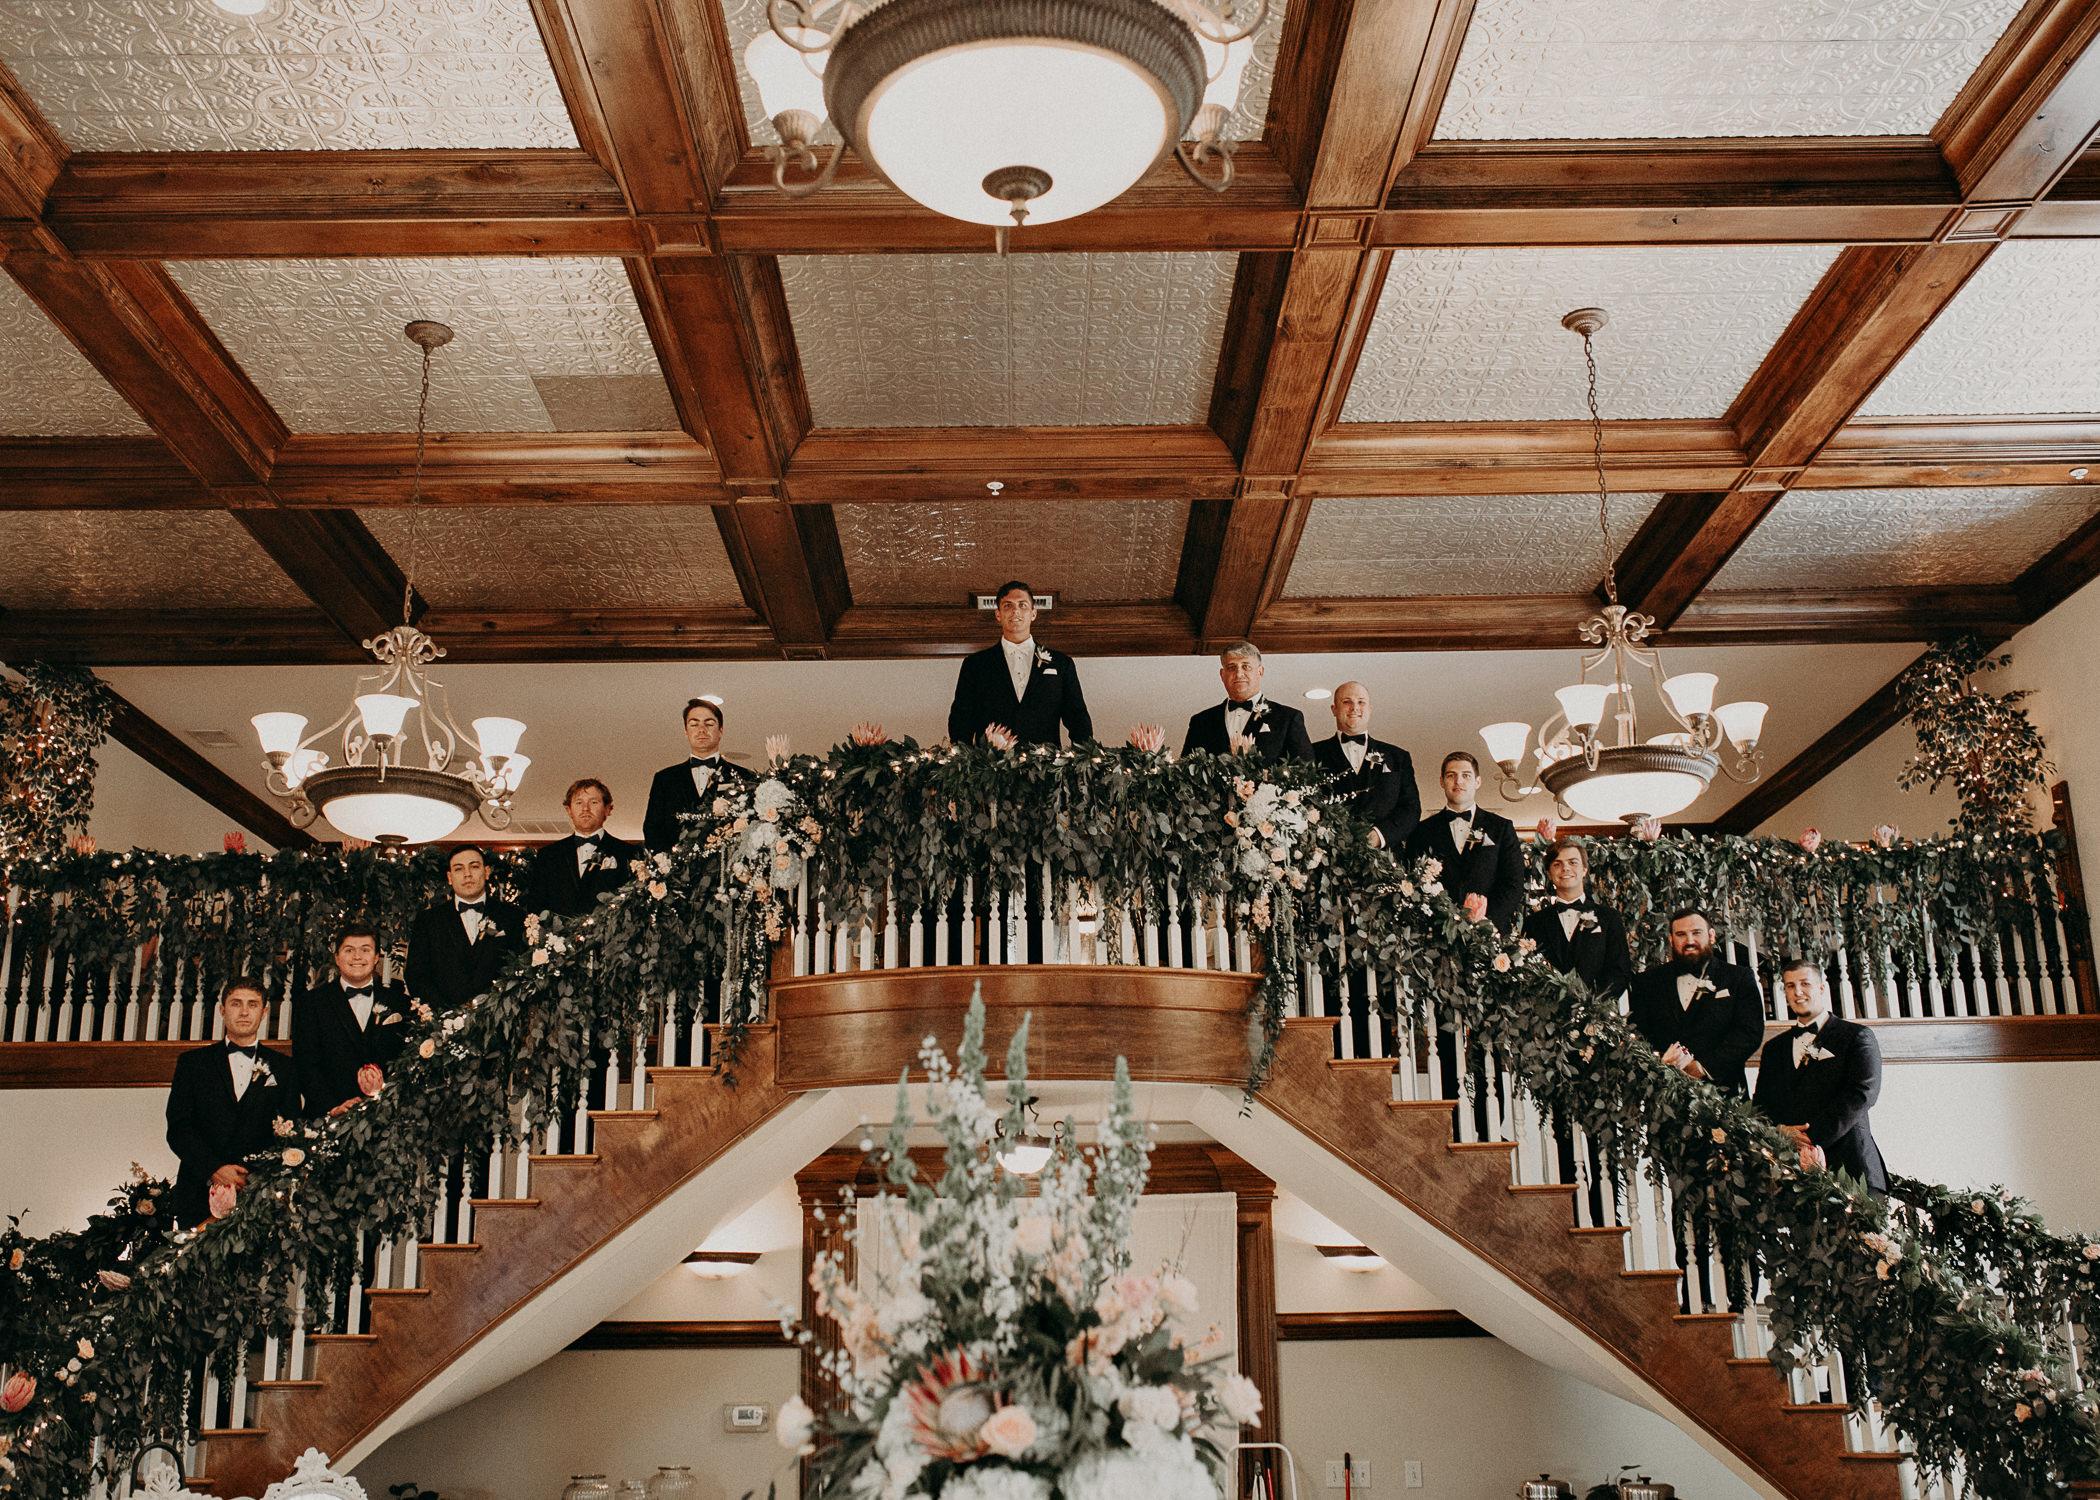 27Carl House Wedding Venue Ga, Atlanta Wedding Photographer - Boho, Bohemian, Junebug Weddings, Vintage, Retro, Trendy. Aline Marin Photography. .jpg